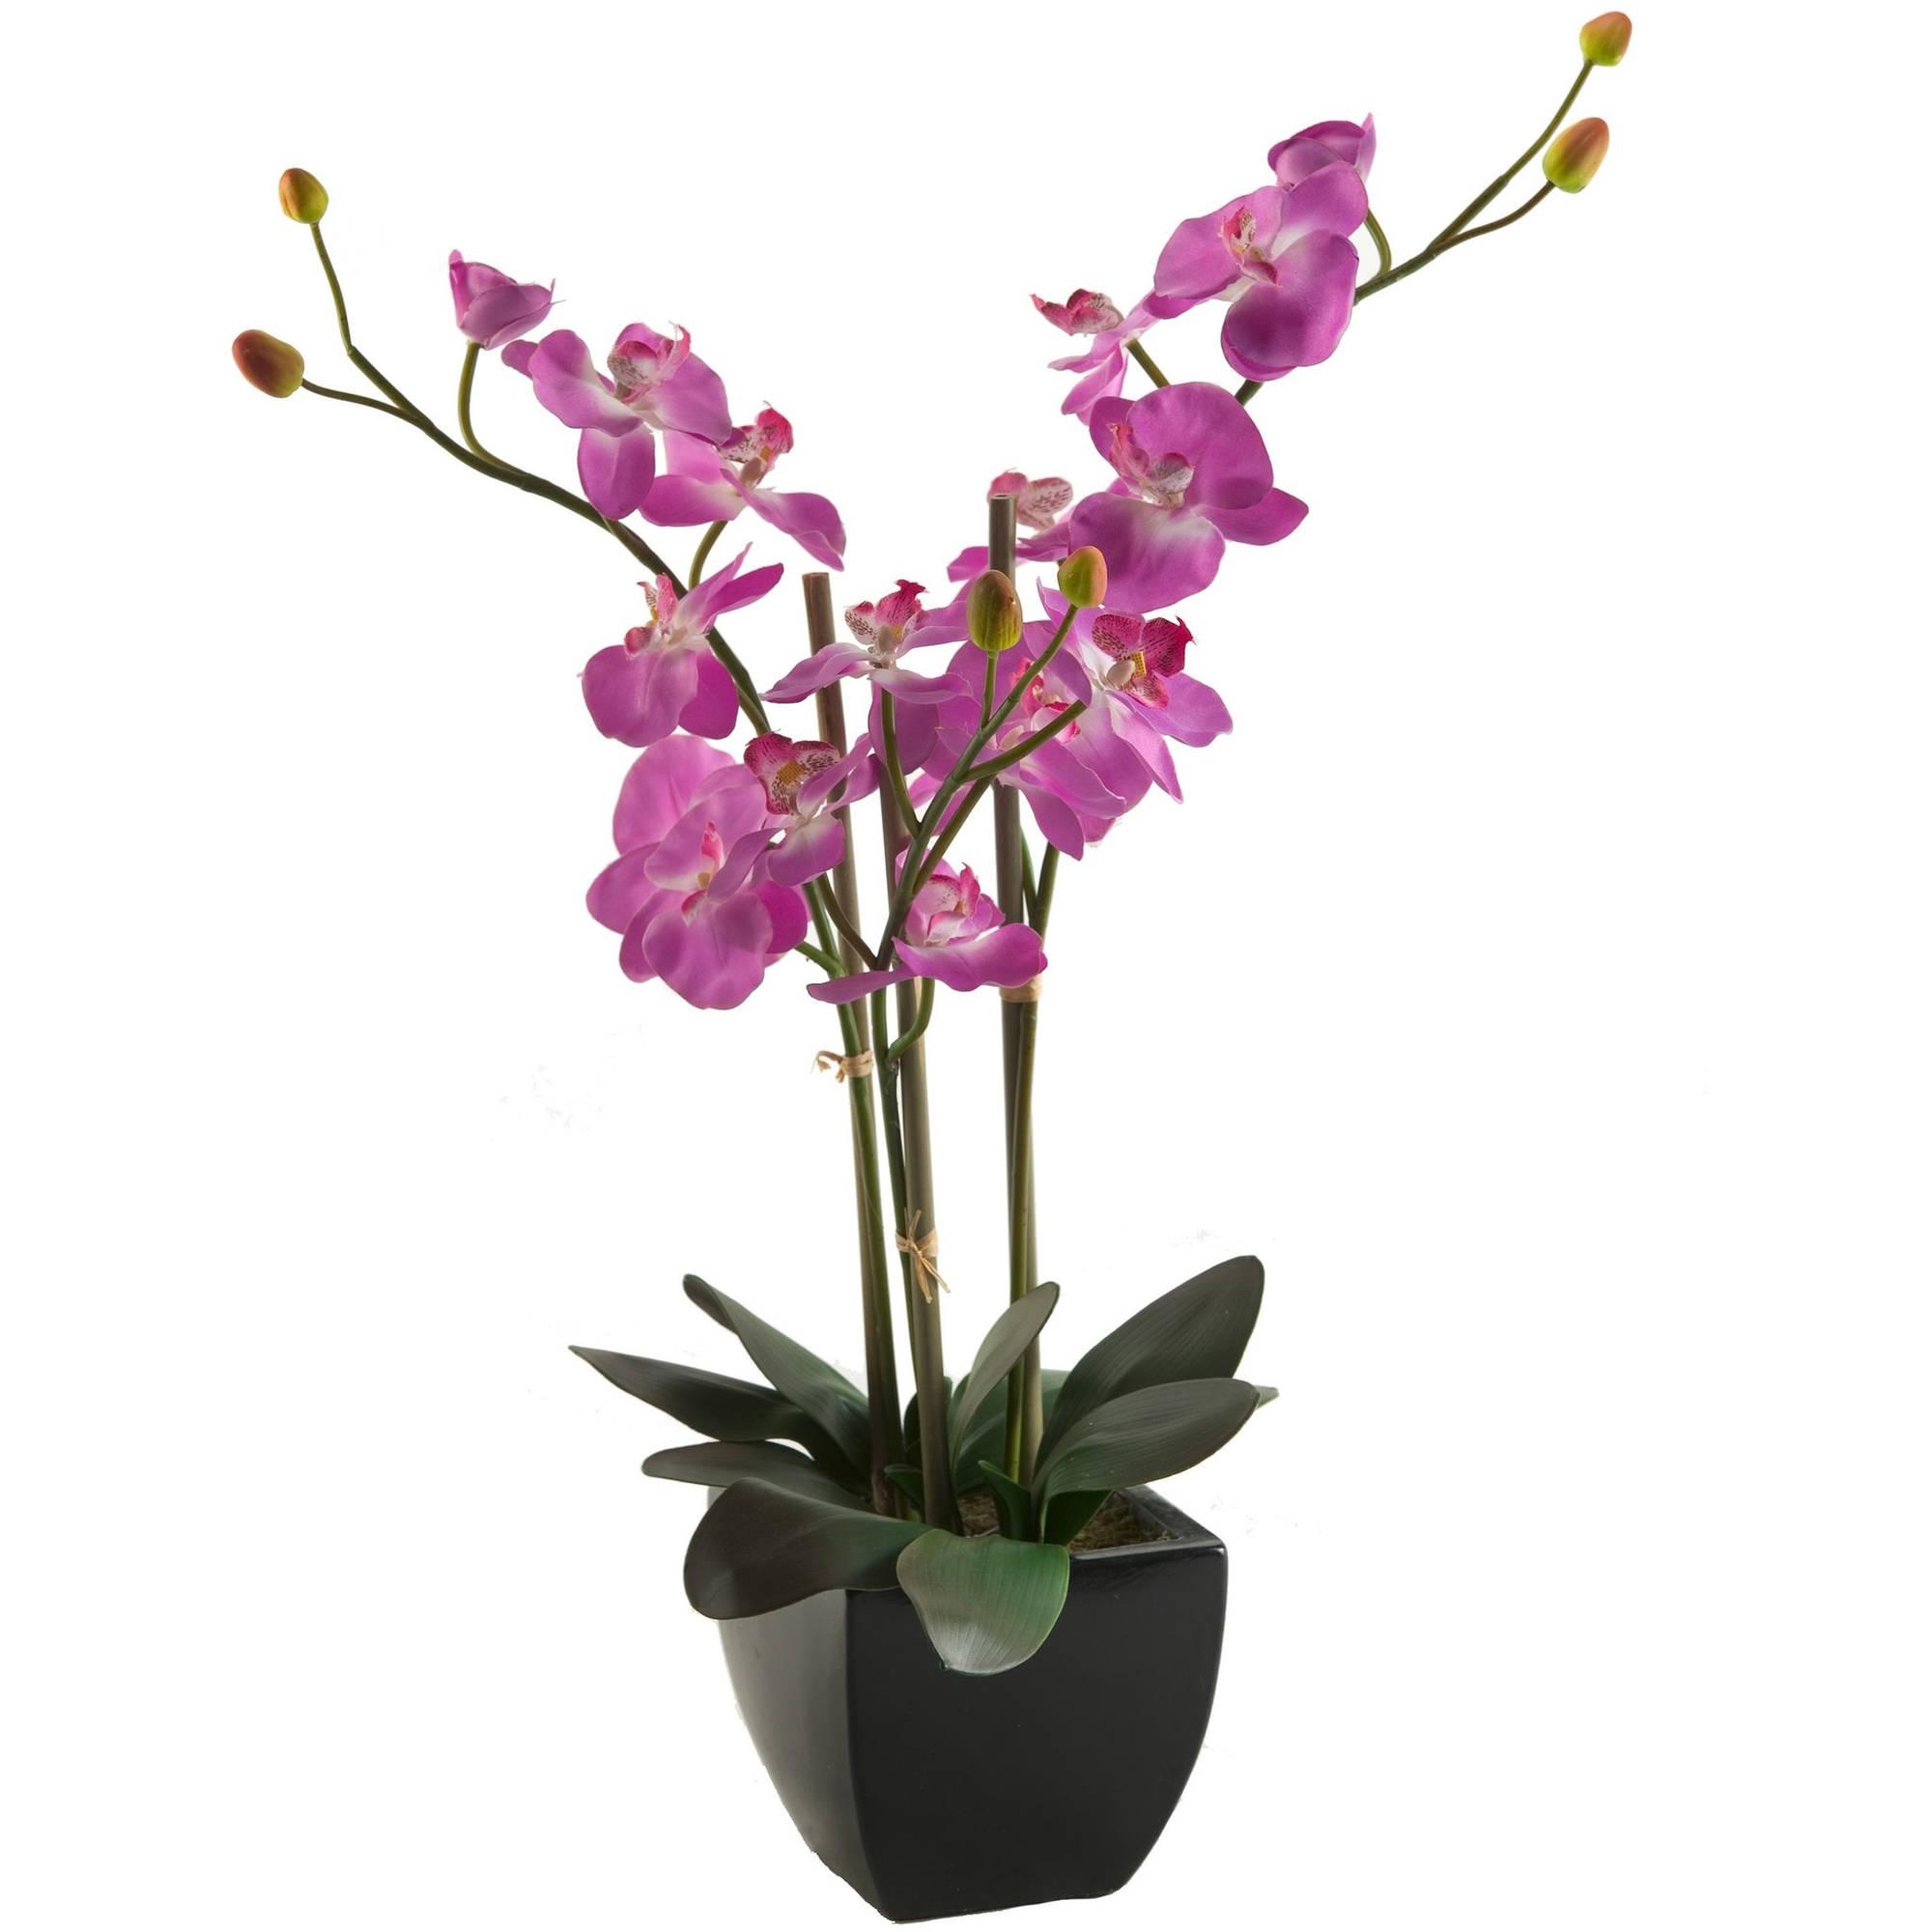 D&W Silks Purple Phael Orchids in Black Ceramic Planter